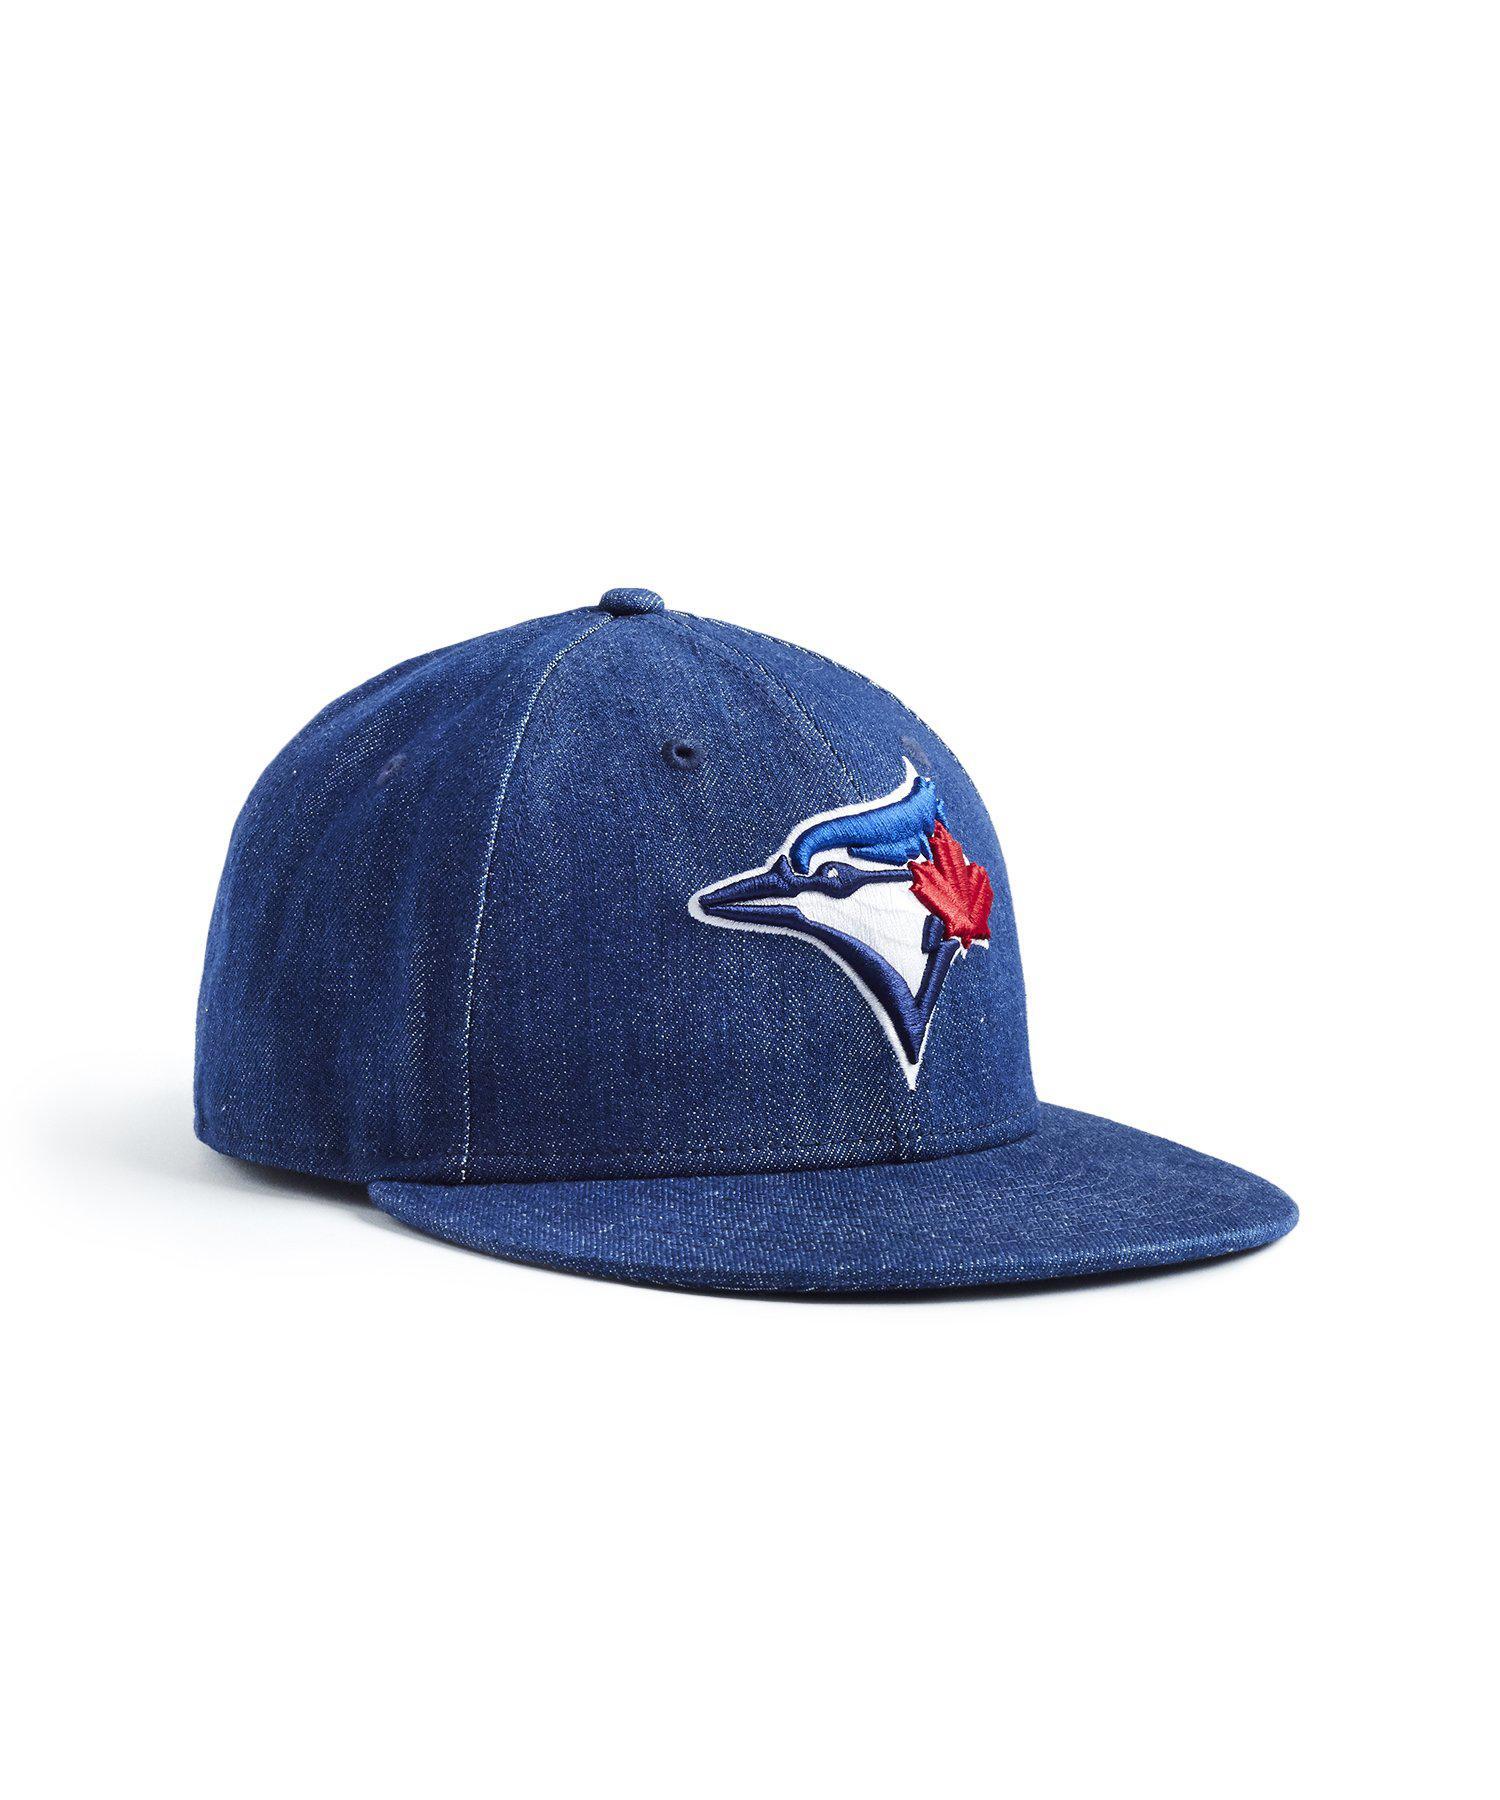 finest selection d4404 3fa6c NEW ERA HATS - Mlb Toronto Blue Jays Cap In Cone Denim for Men - Lyst. View  fullscreen